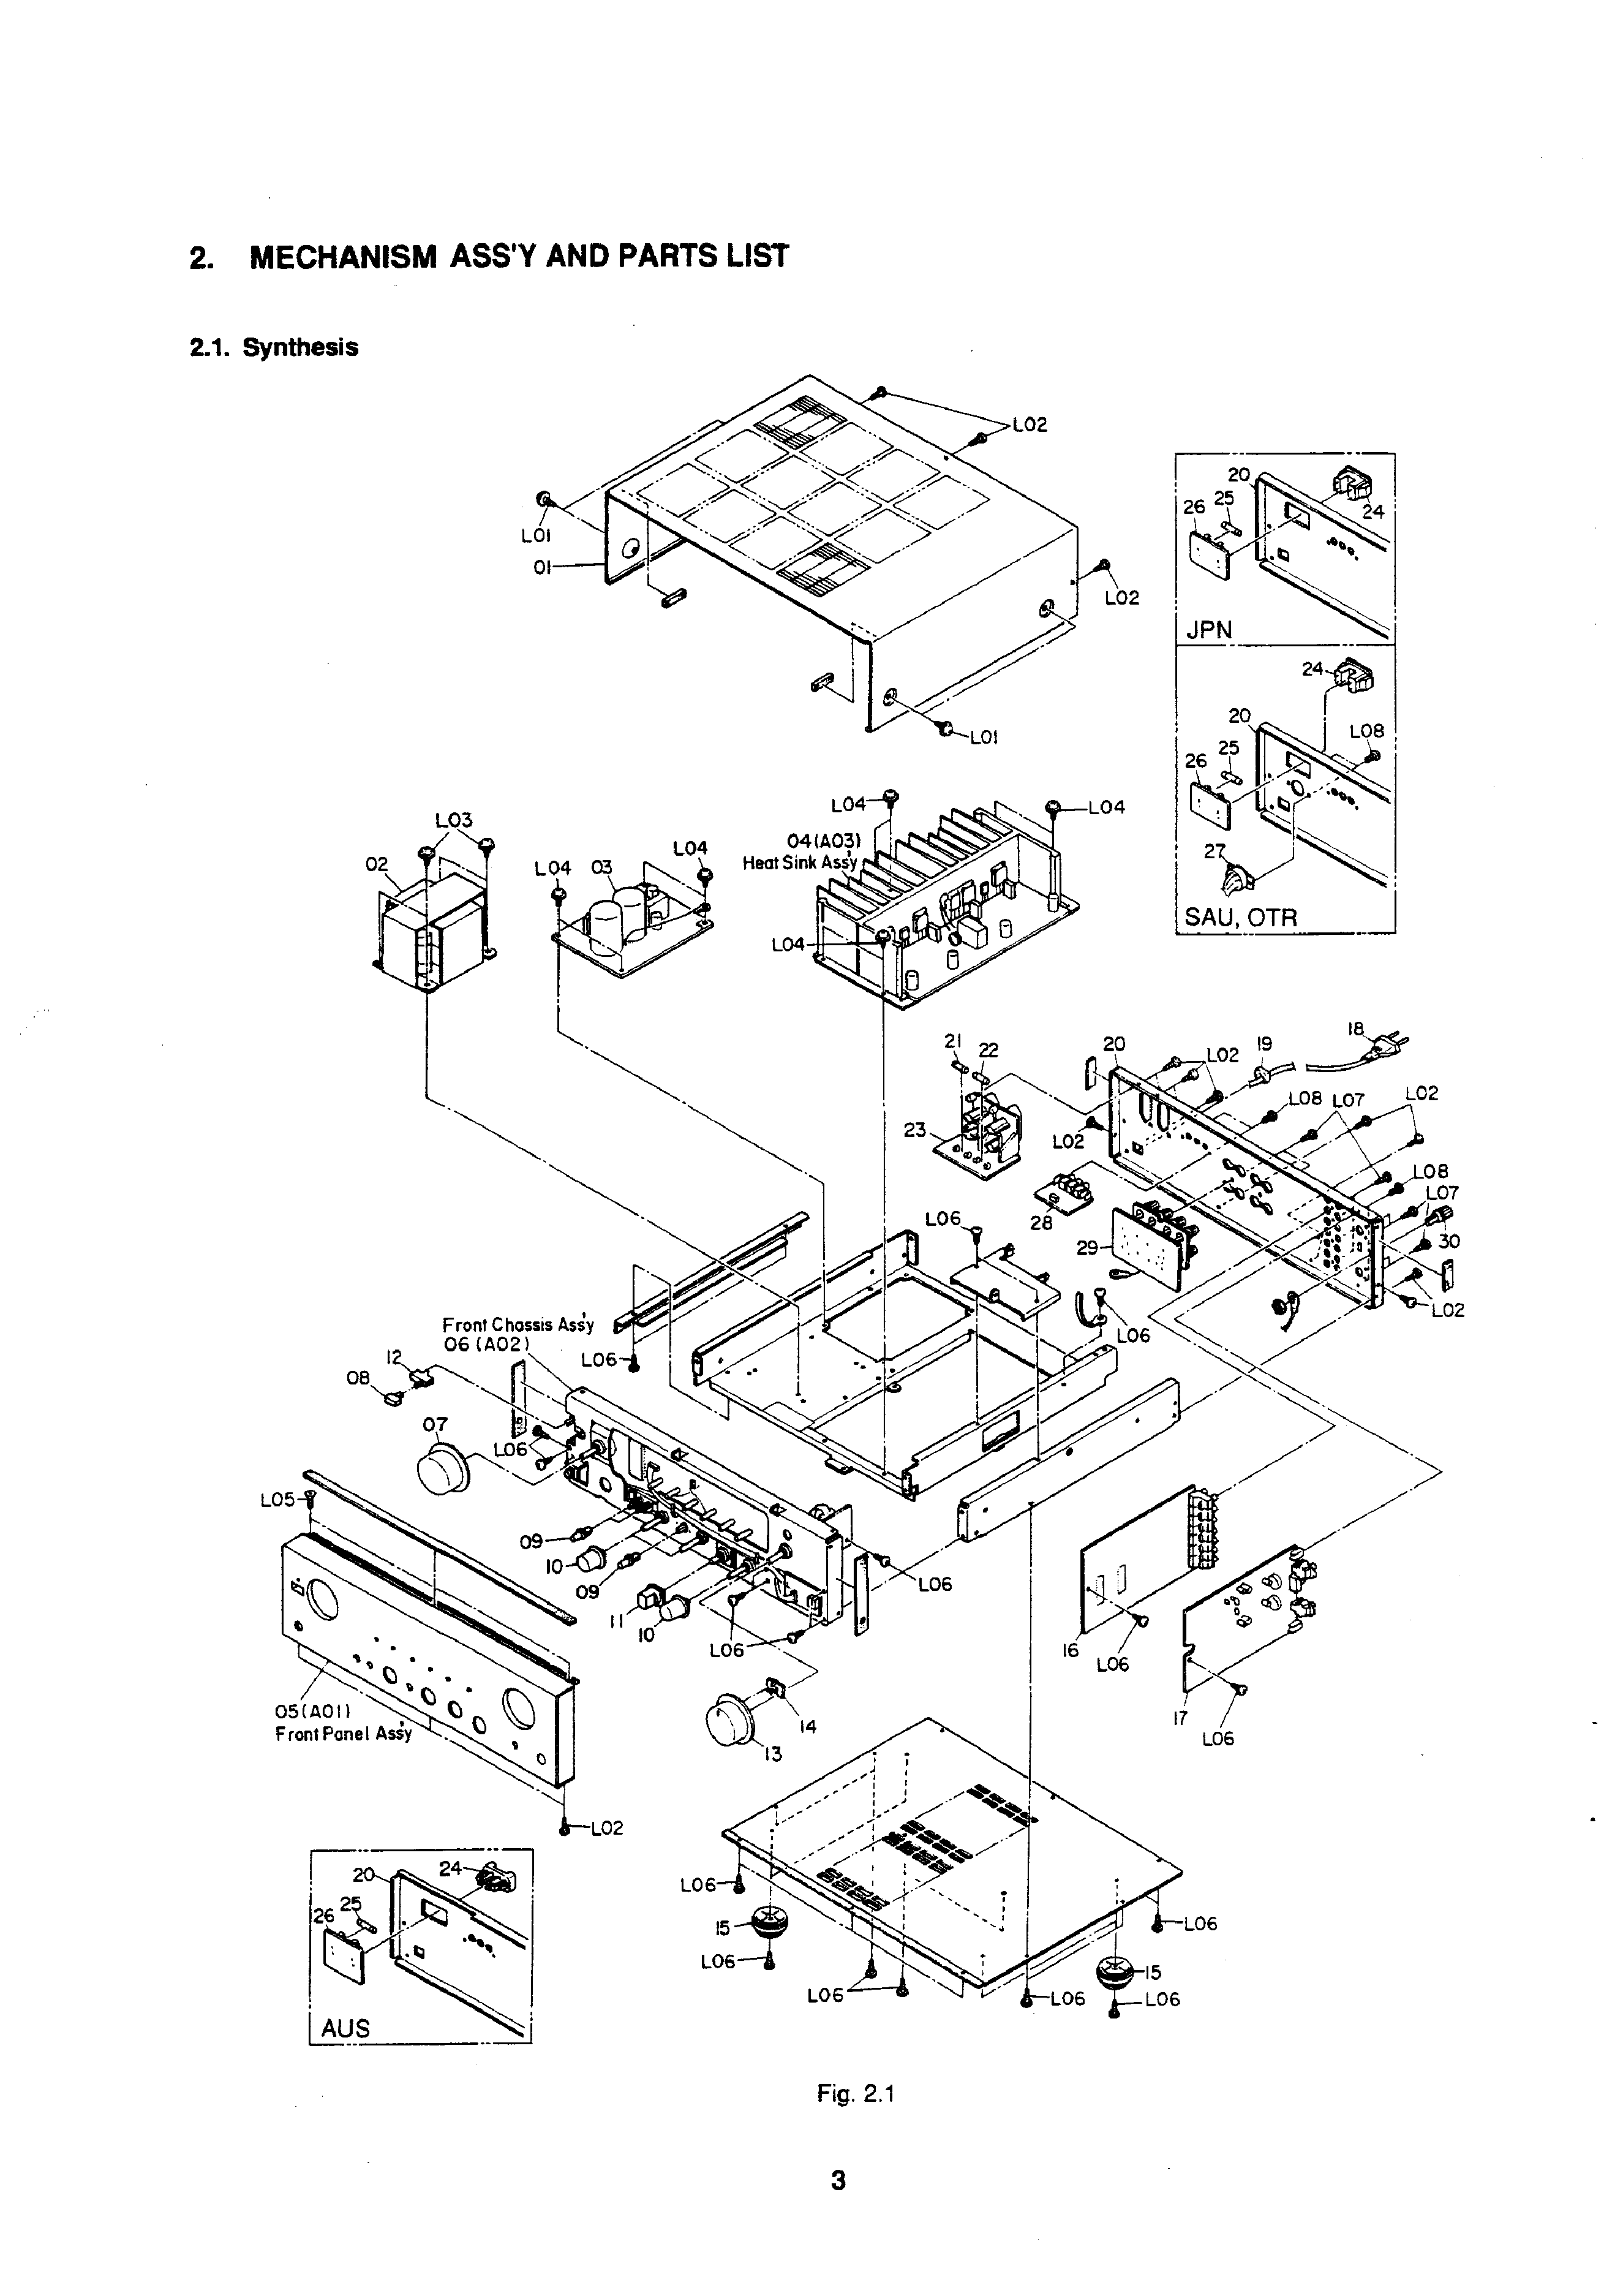 service manual for nakamichi ia-2